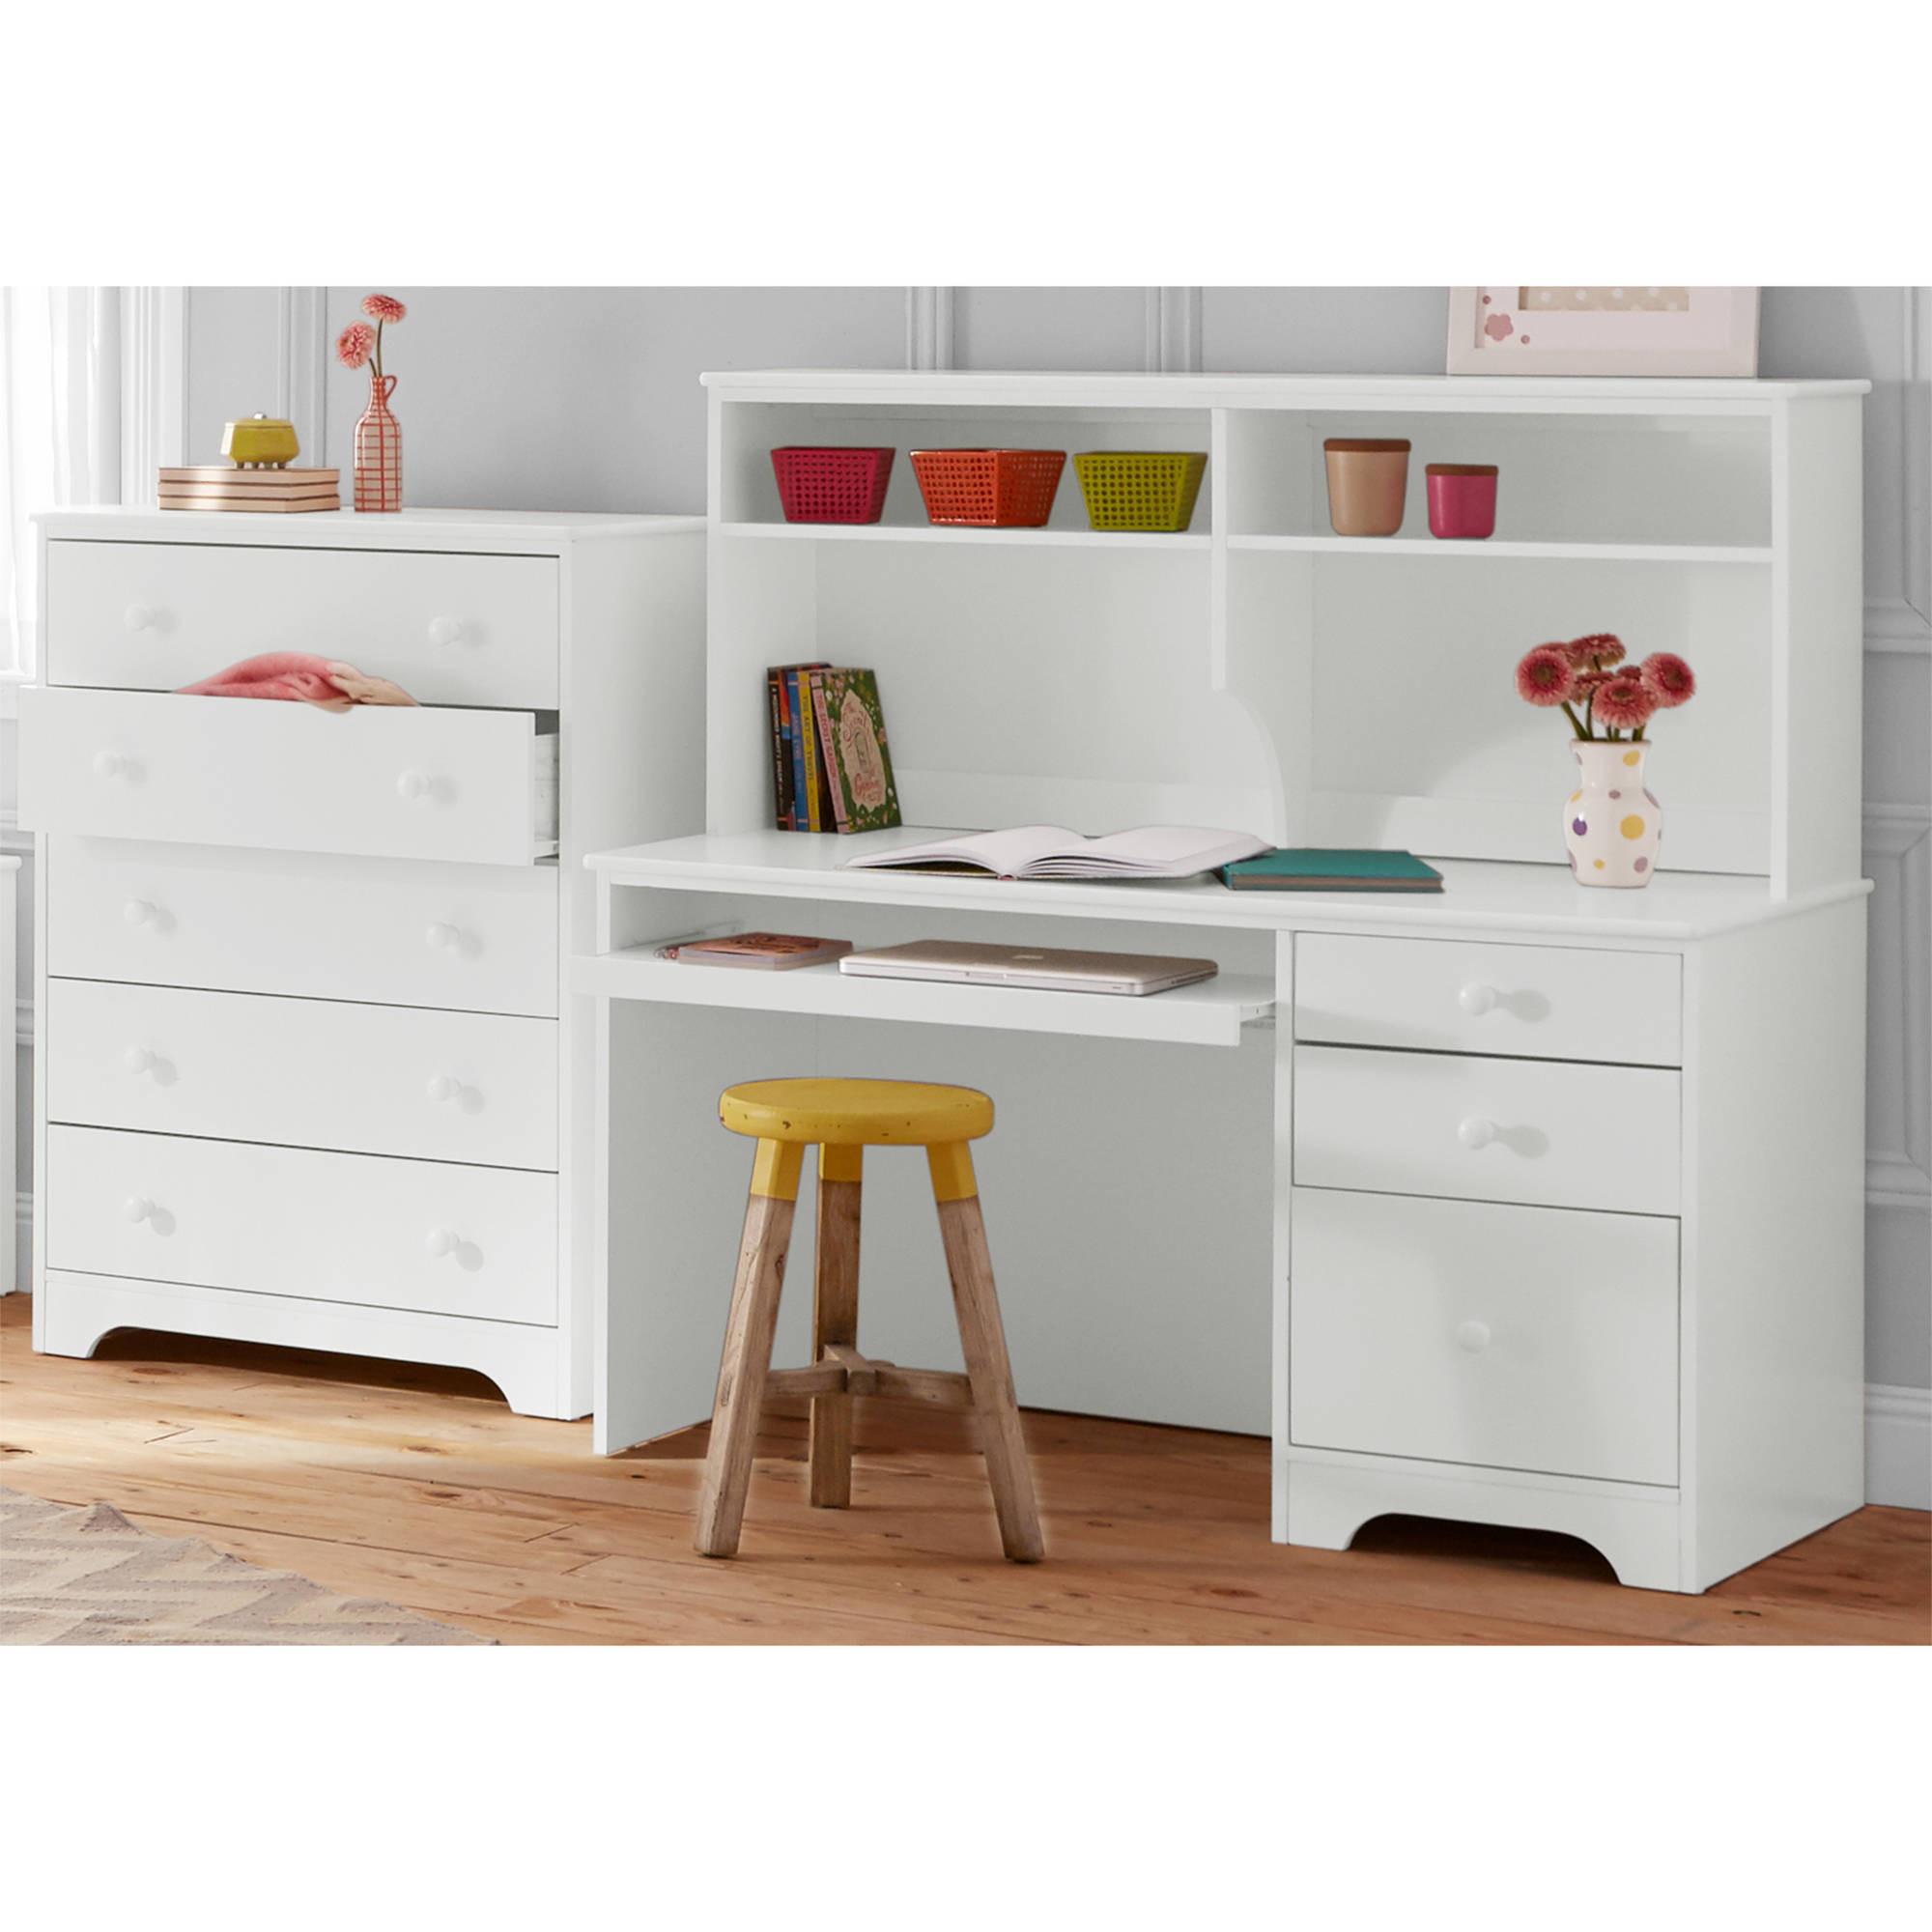 Walmart Desk Organizer  Better Homes and Gardens 8 Cube Organizer Multiple Colors